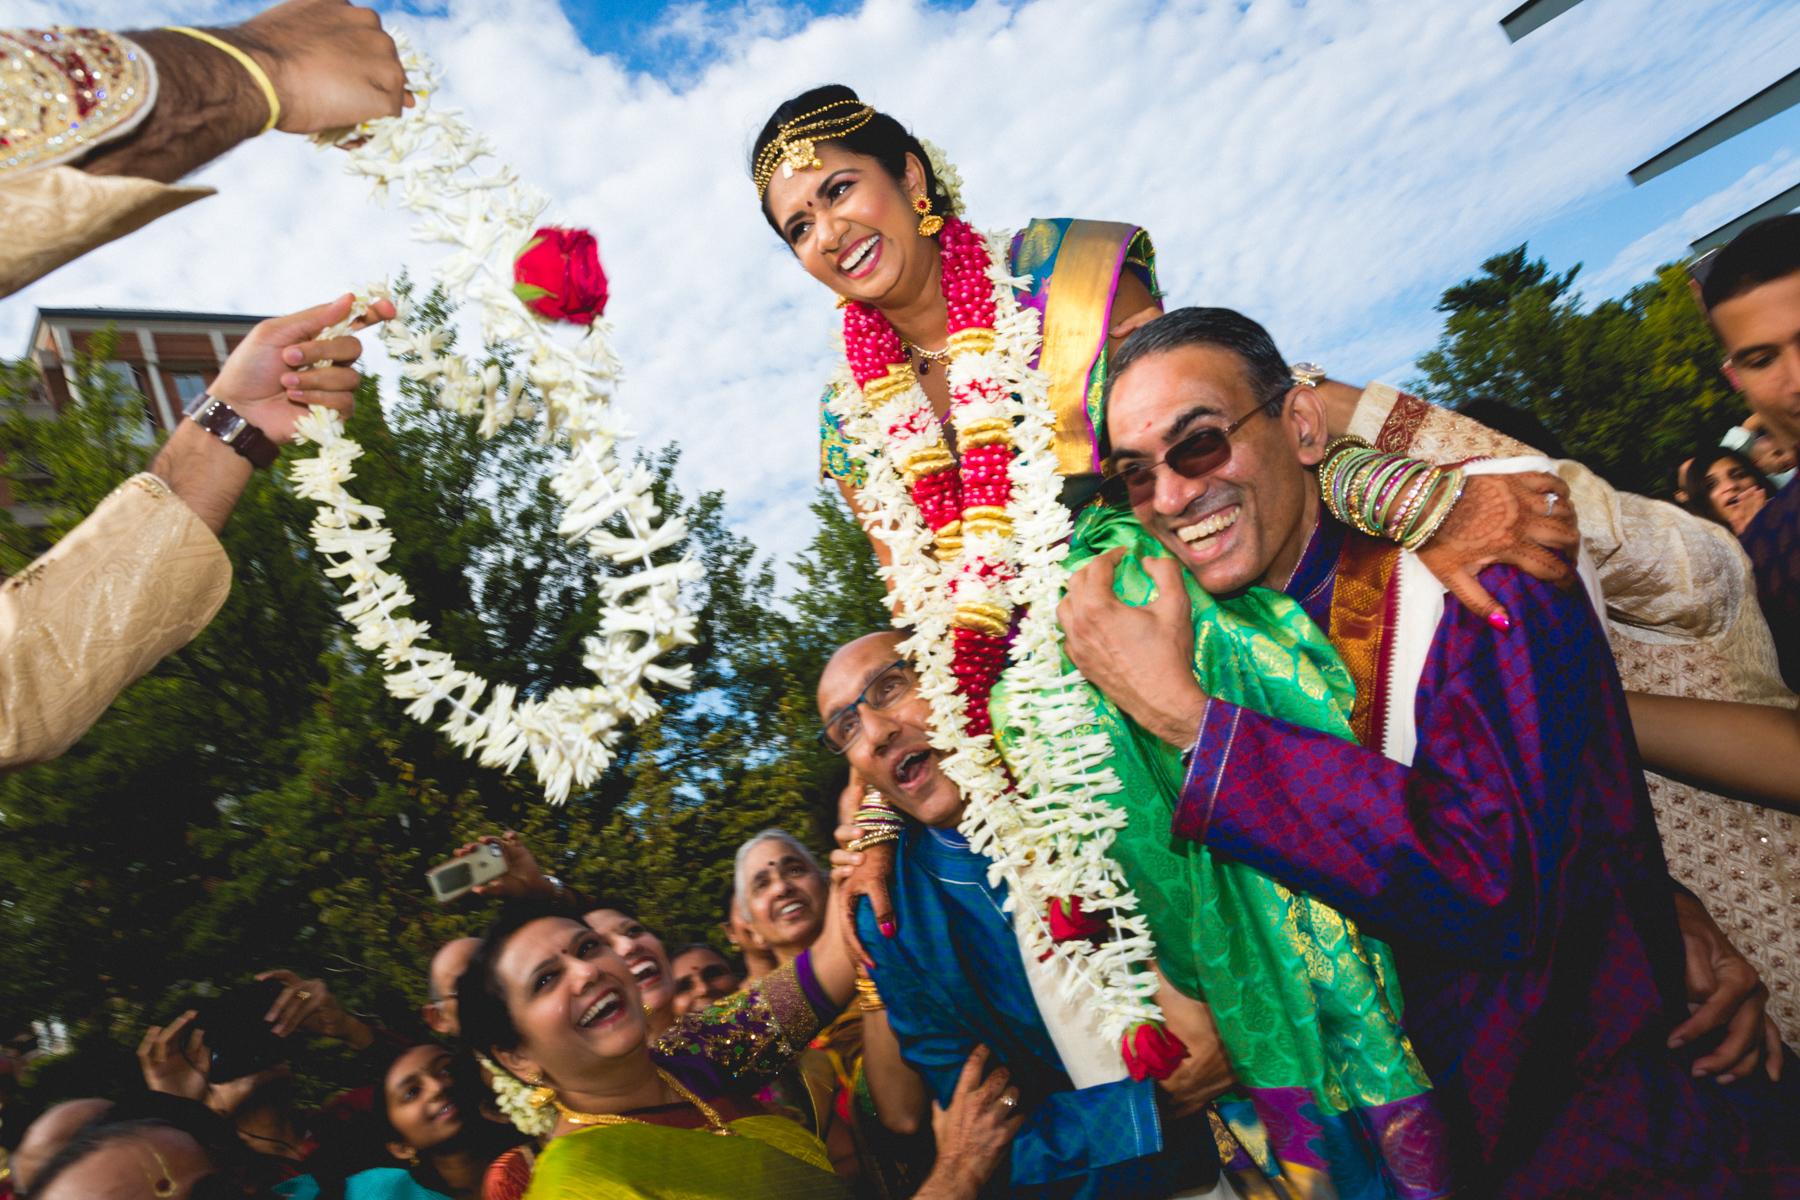 edward-b-photography-indian-wedding-3.jpg